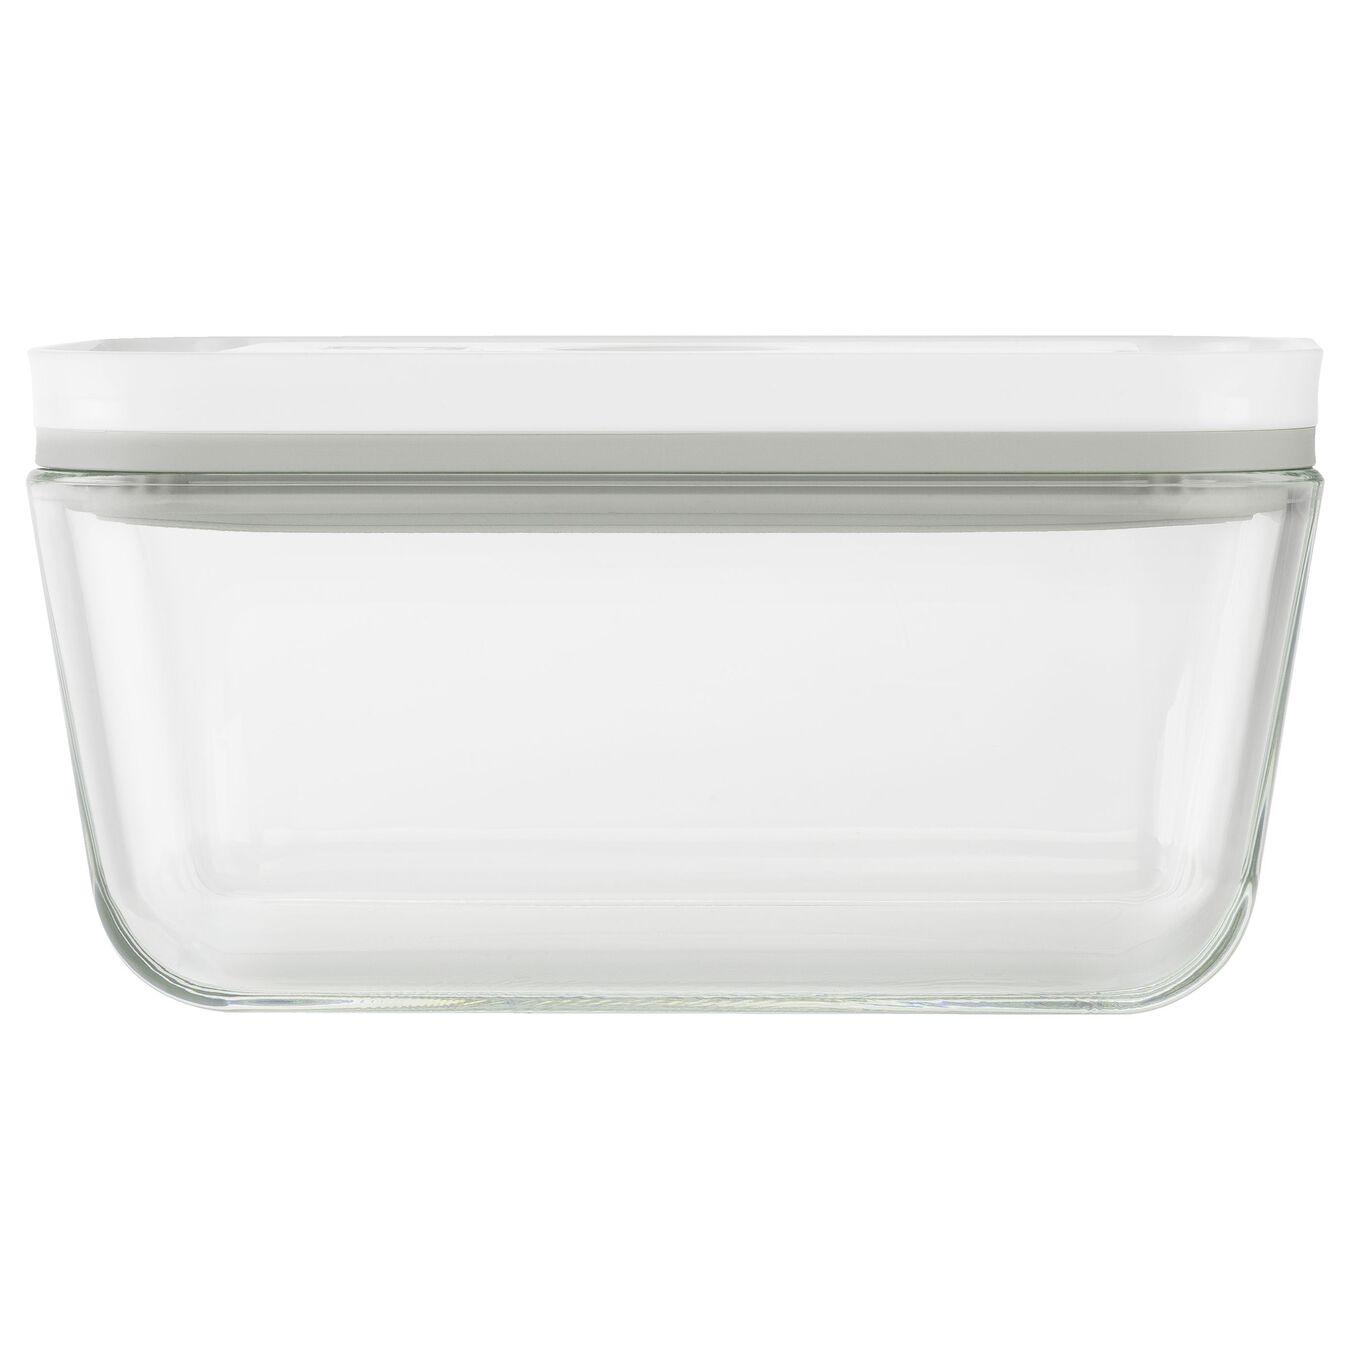 medium Vacuum box, Borosilicate glass, white,,large 3